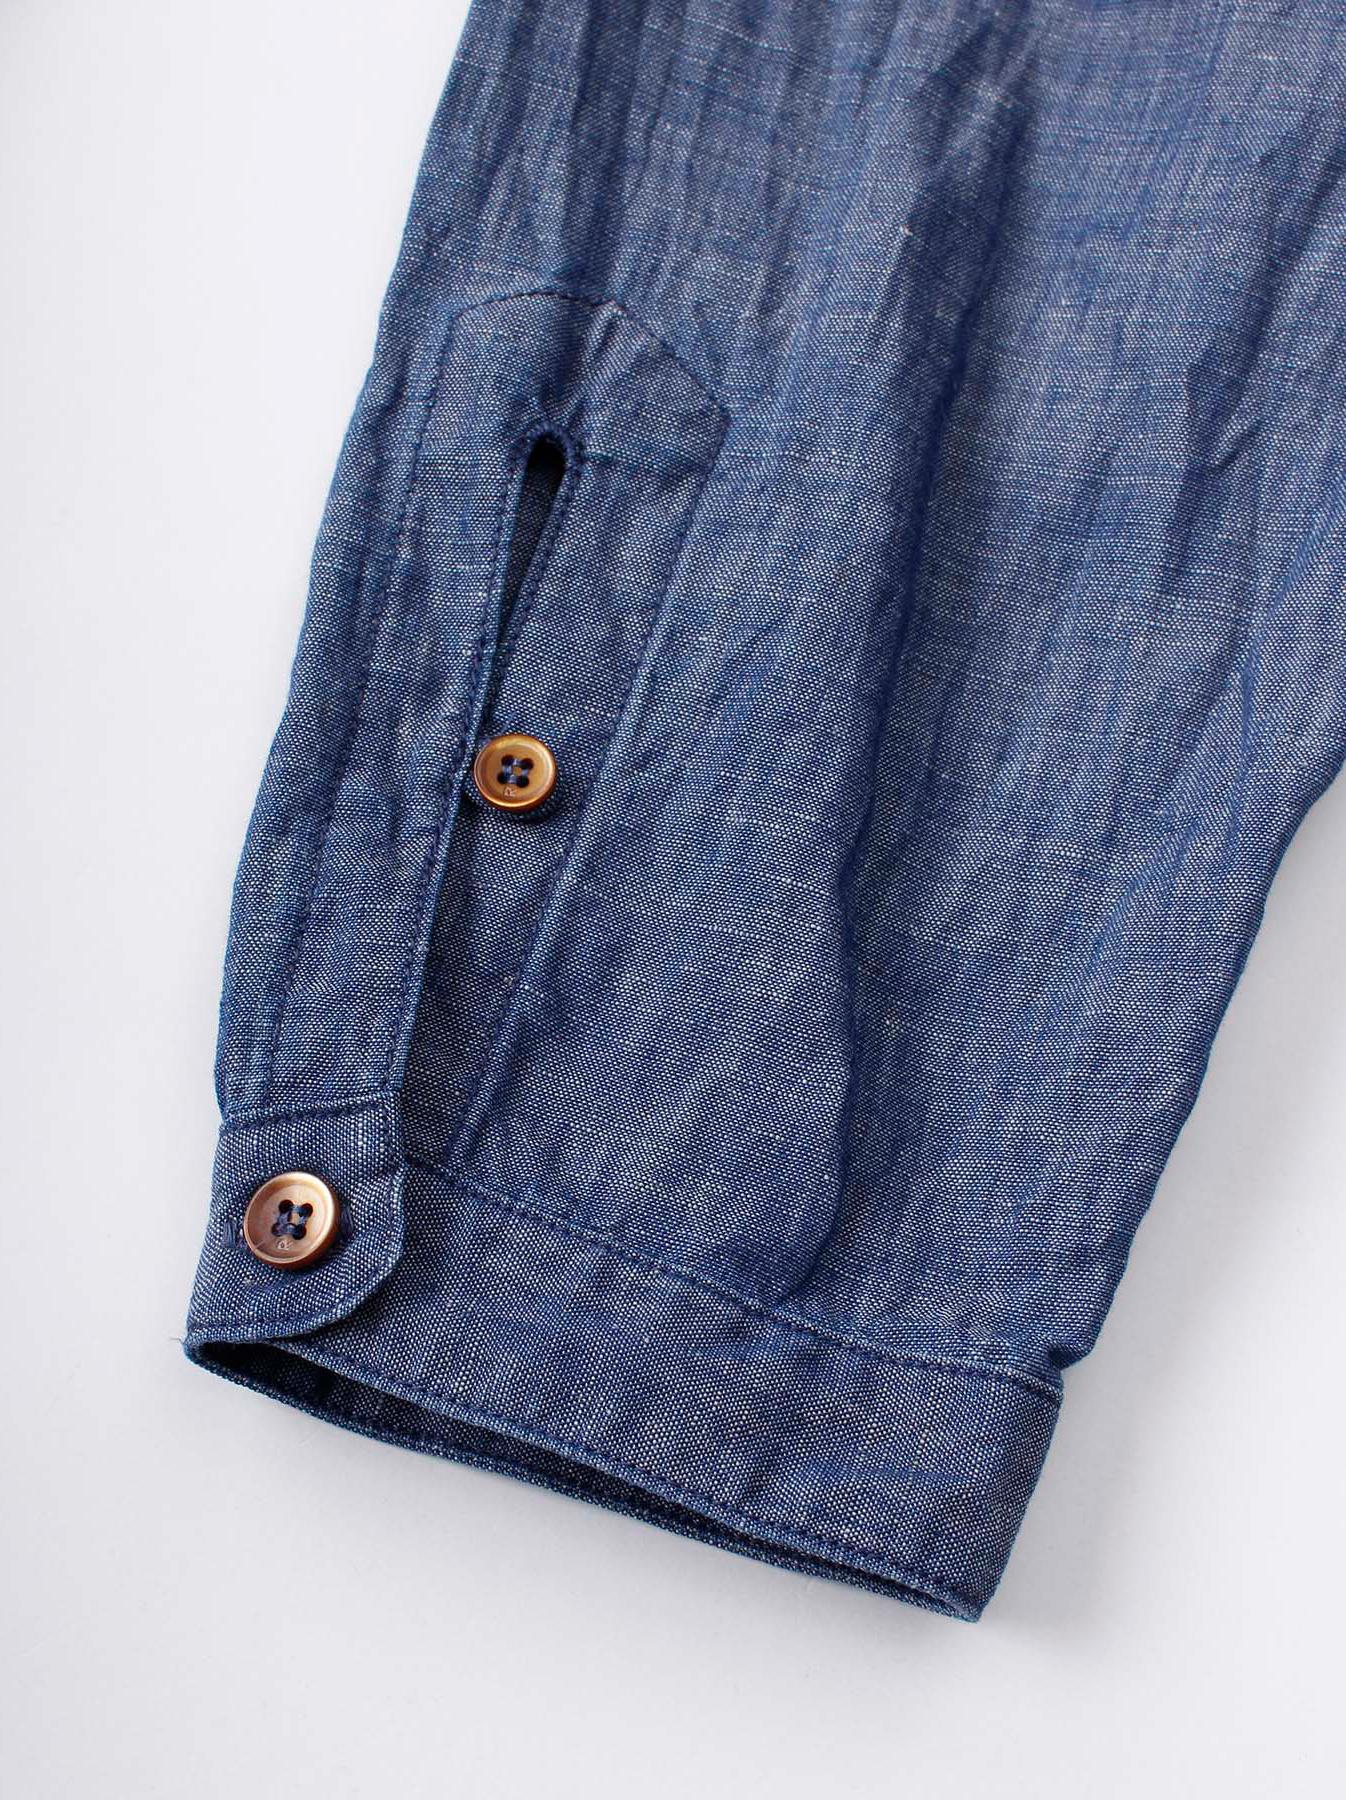 WH Cotton Linen Umahiko Pullover Shirt-9